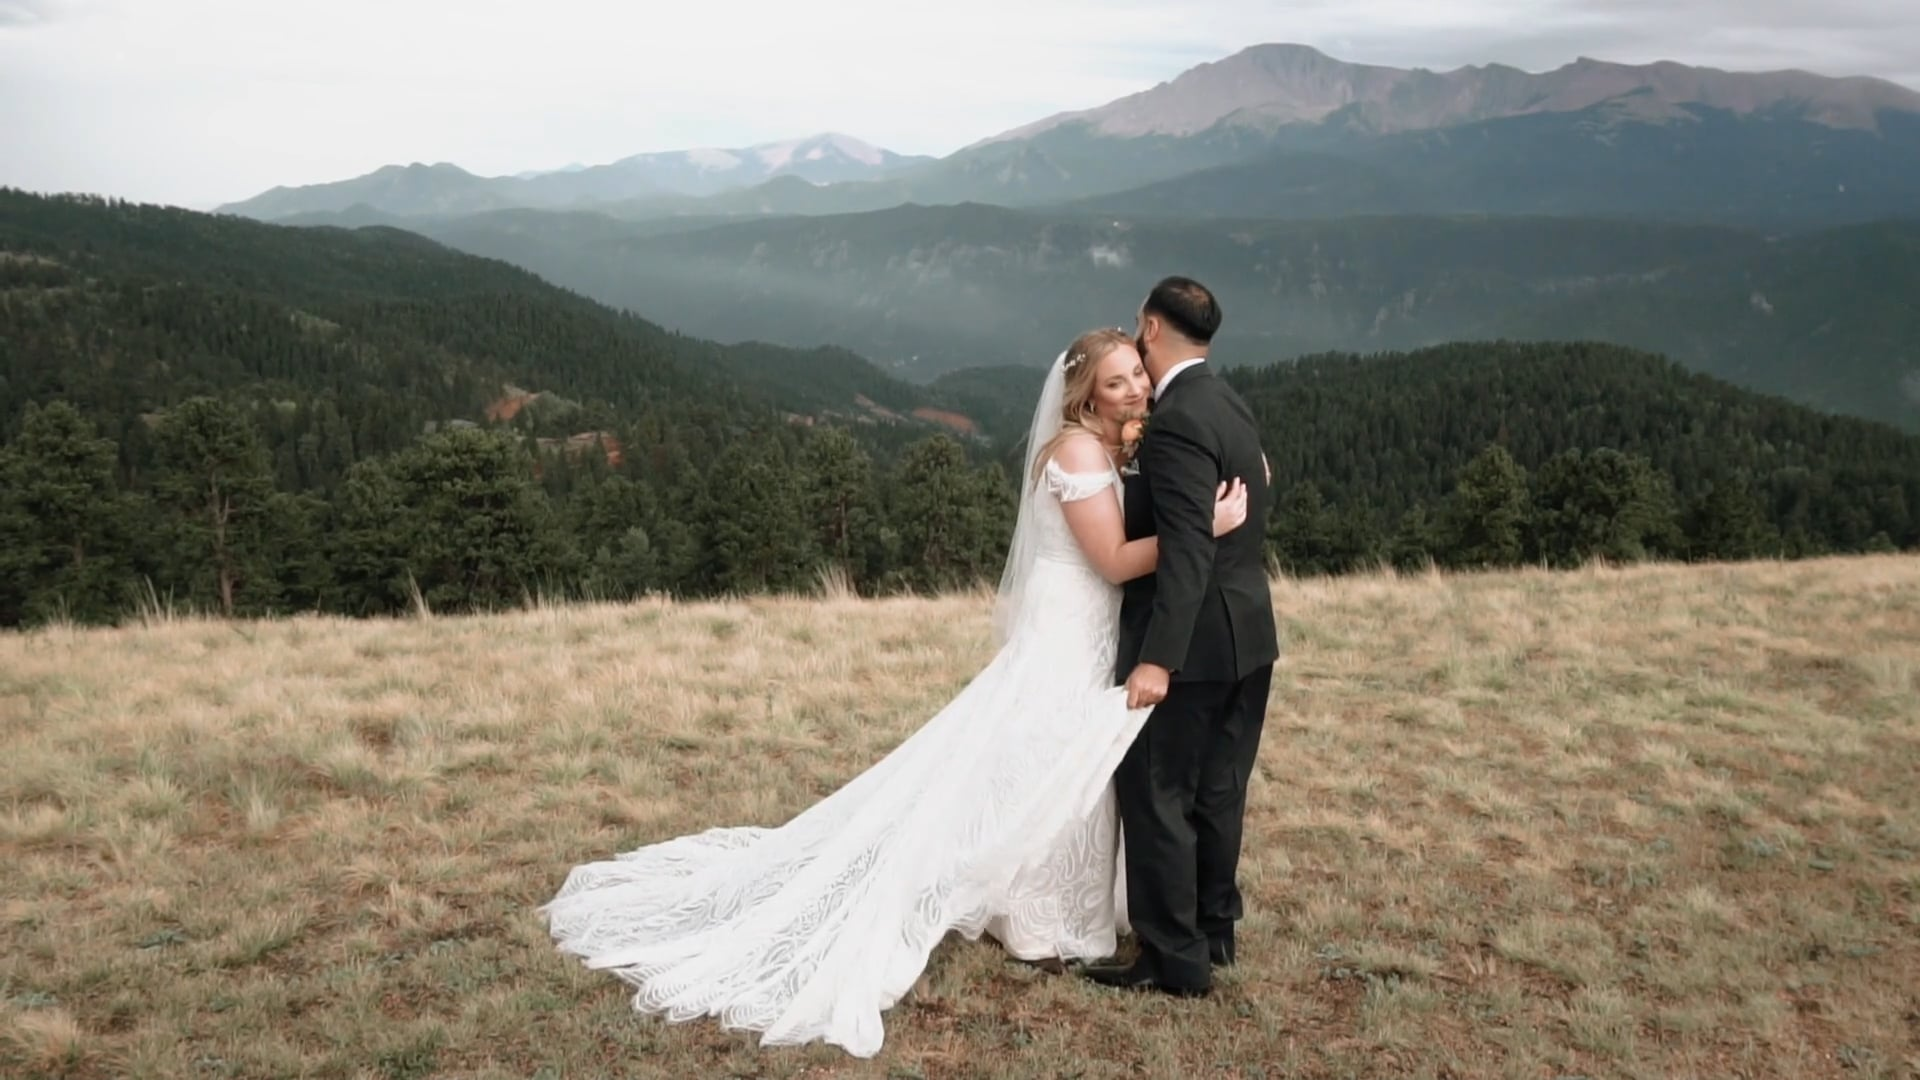 Woodland Park Wedding Video - Carly & Corey